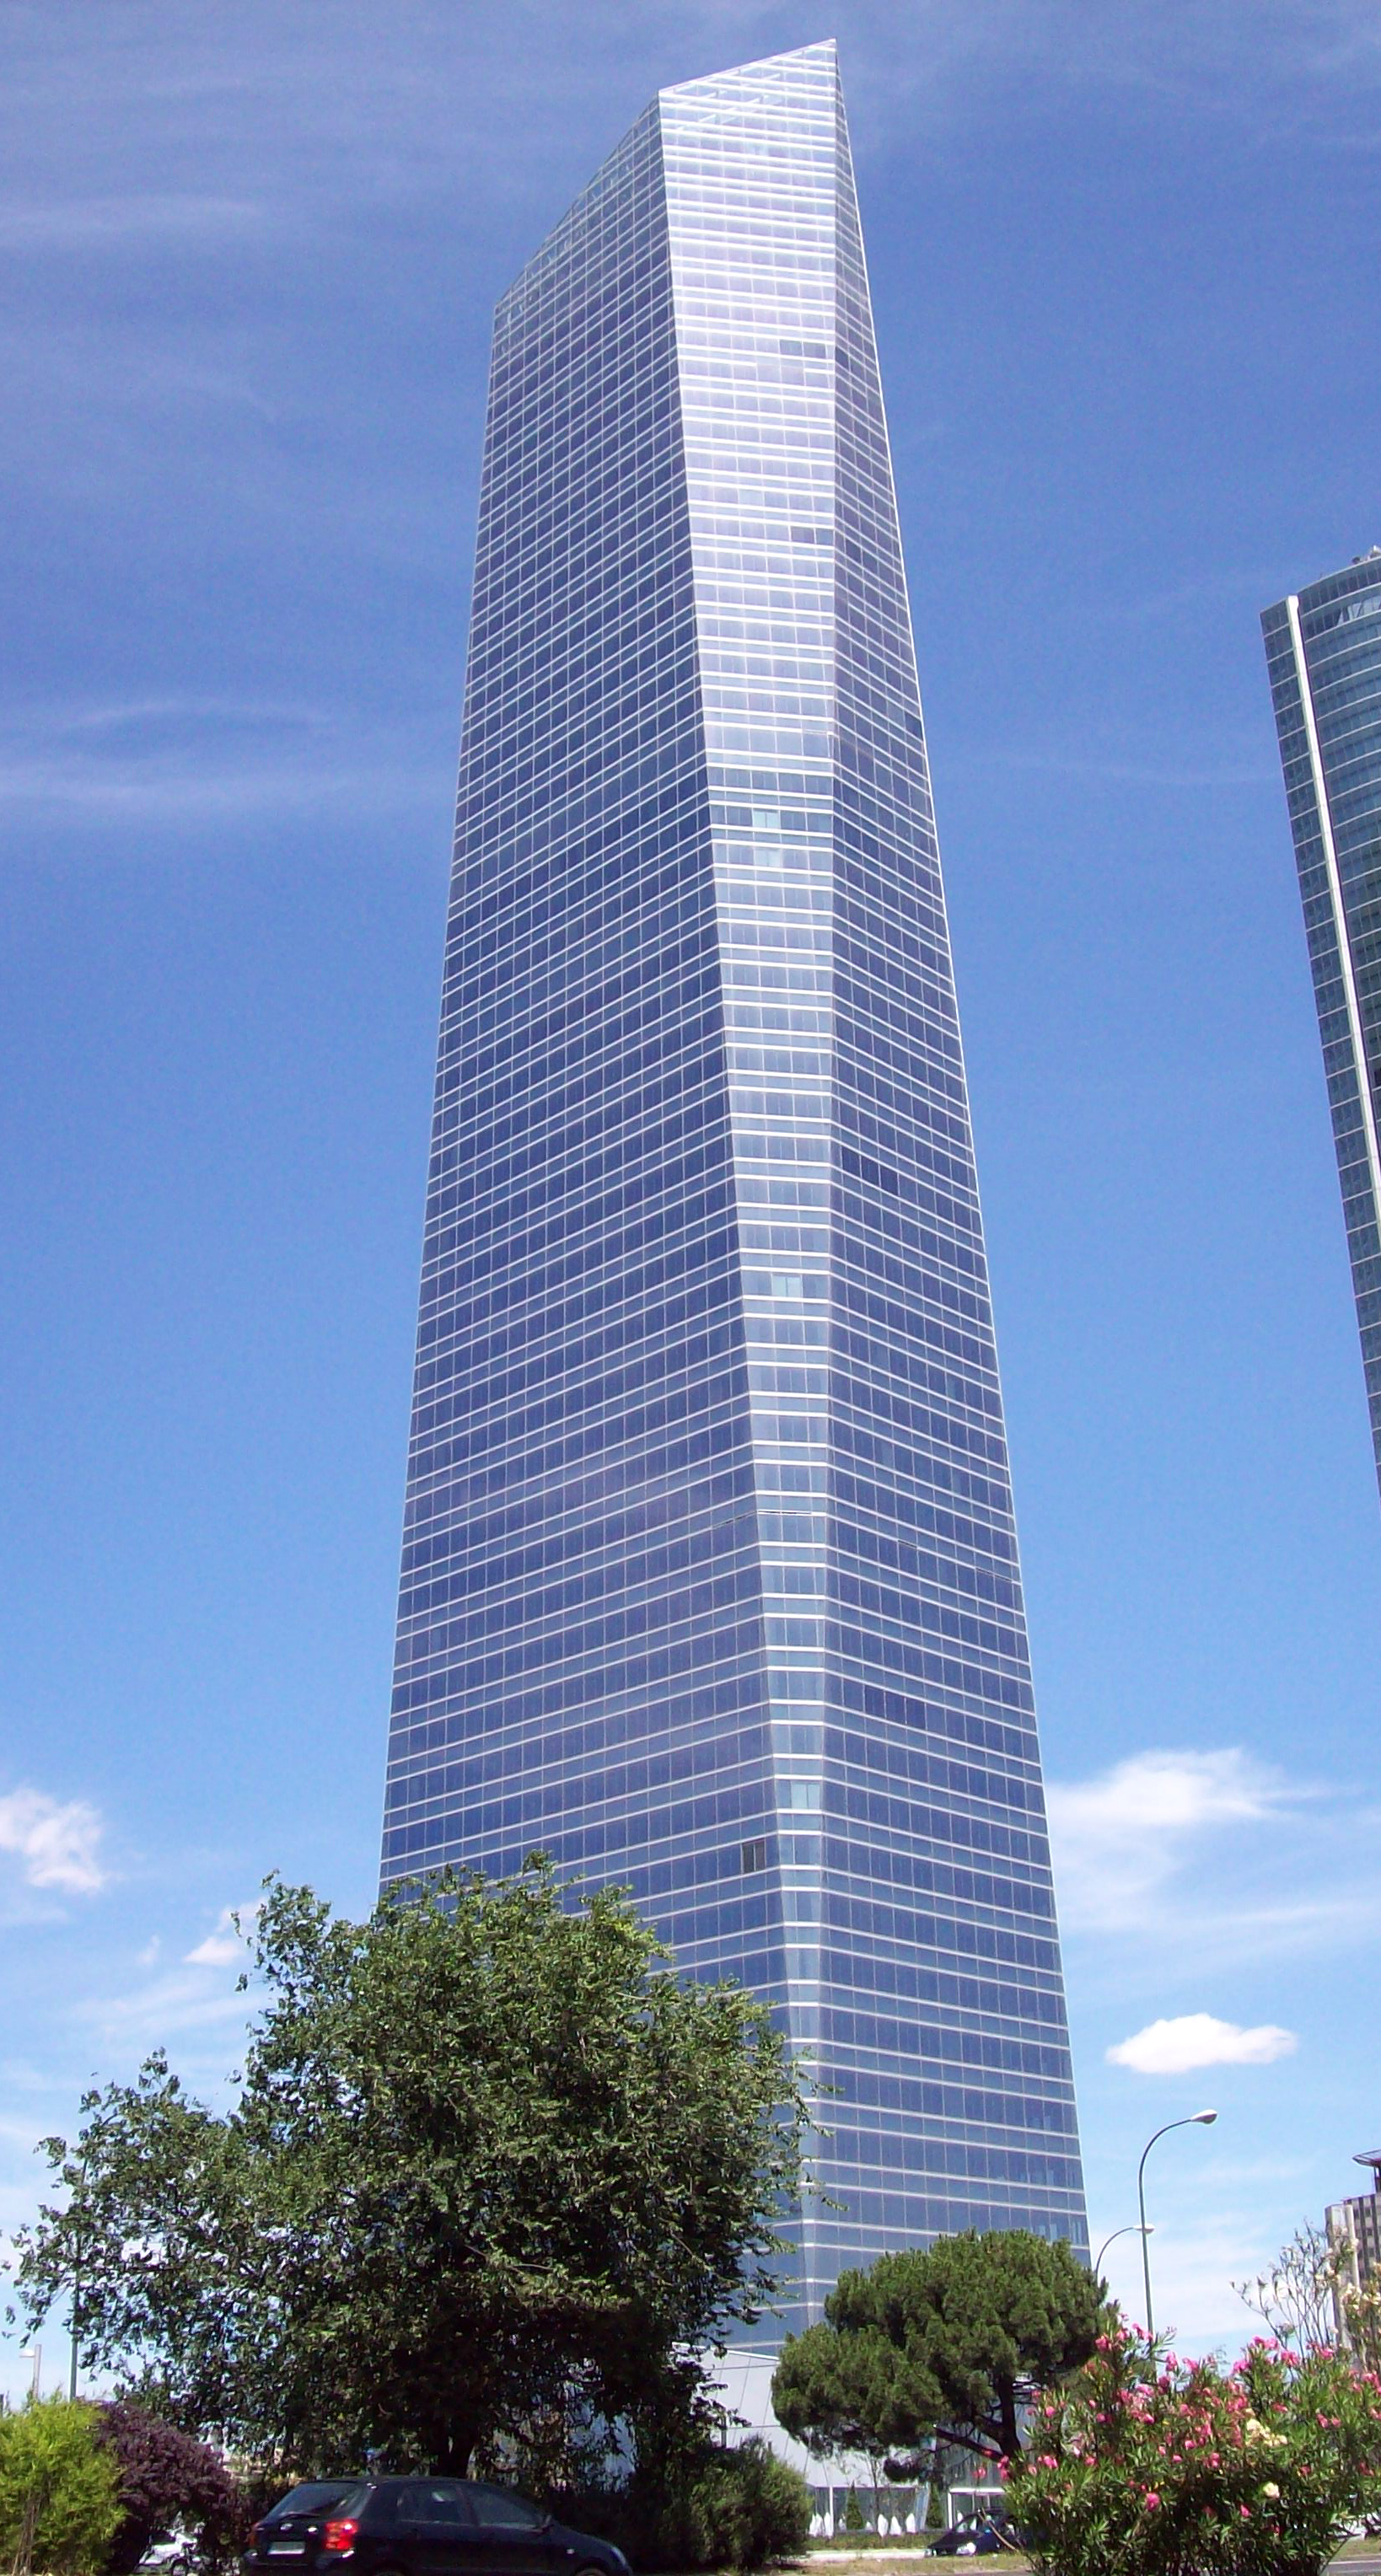 Torre de Cristal, Madrid